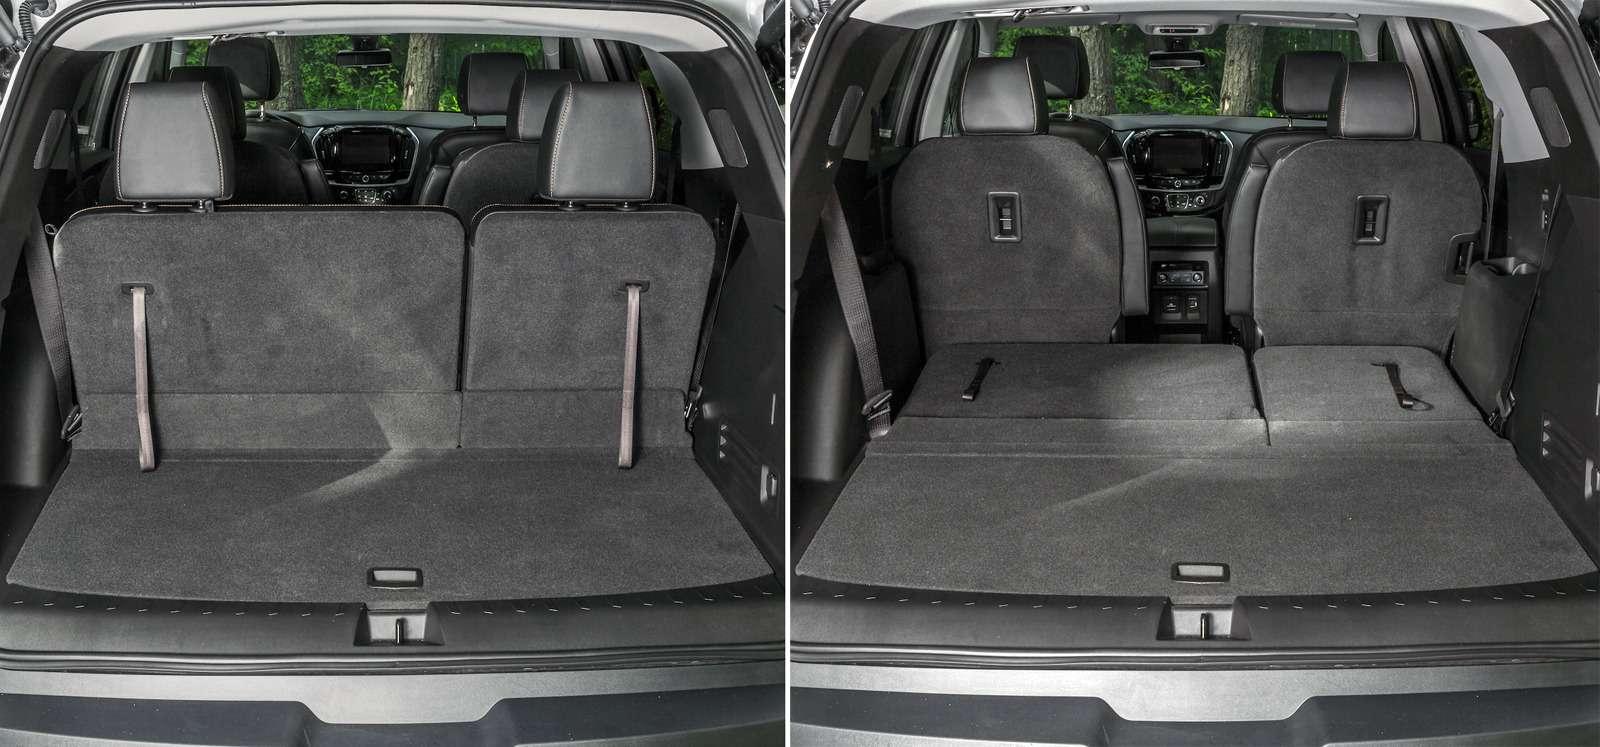 Тест-драйв Chevrolet Traverse: найти ребенка вбагажнике— фото 880711